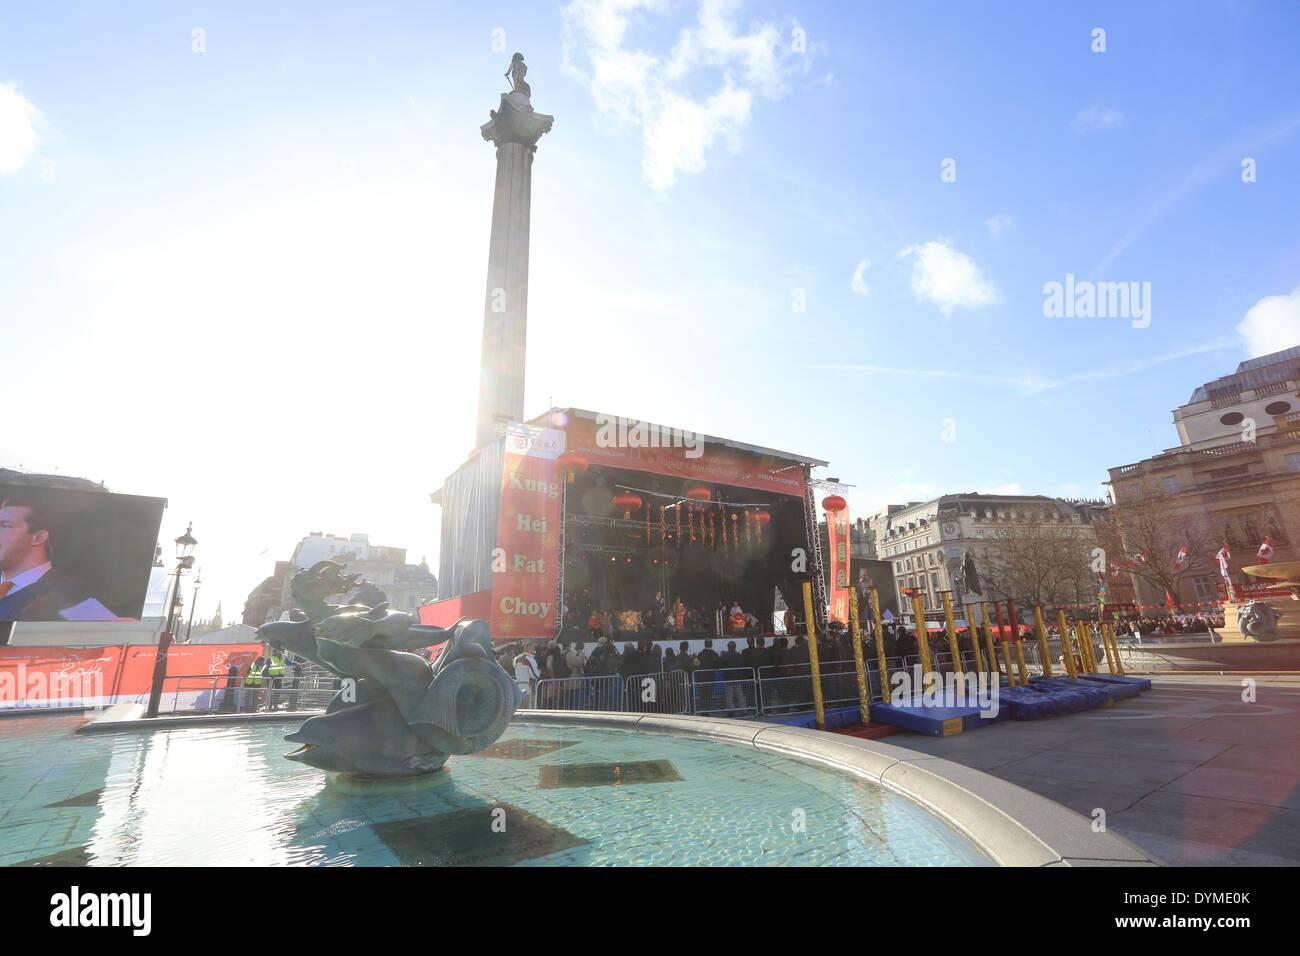 Nouvel An chinois en 2014, année du cheval, à Trafalgar Square, London, England, UK Photo Stock